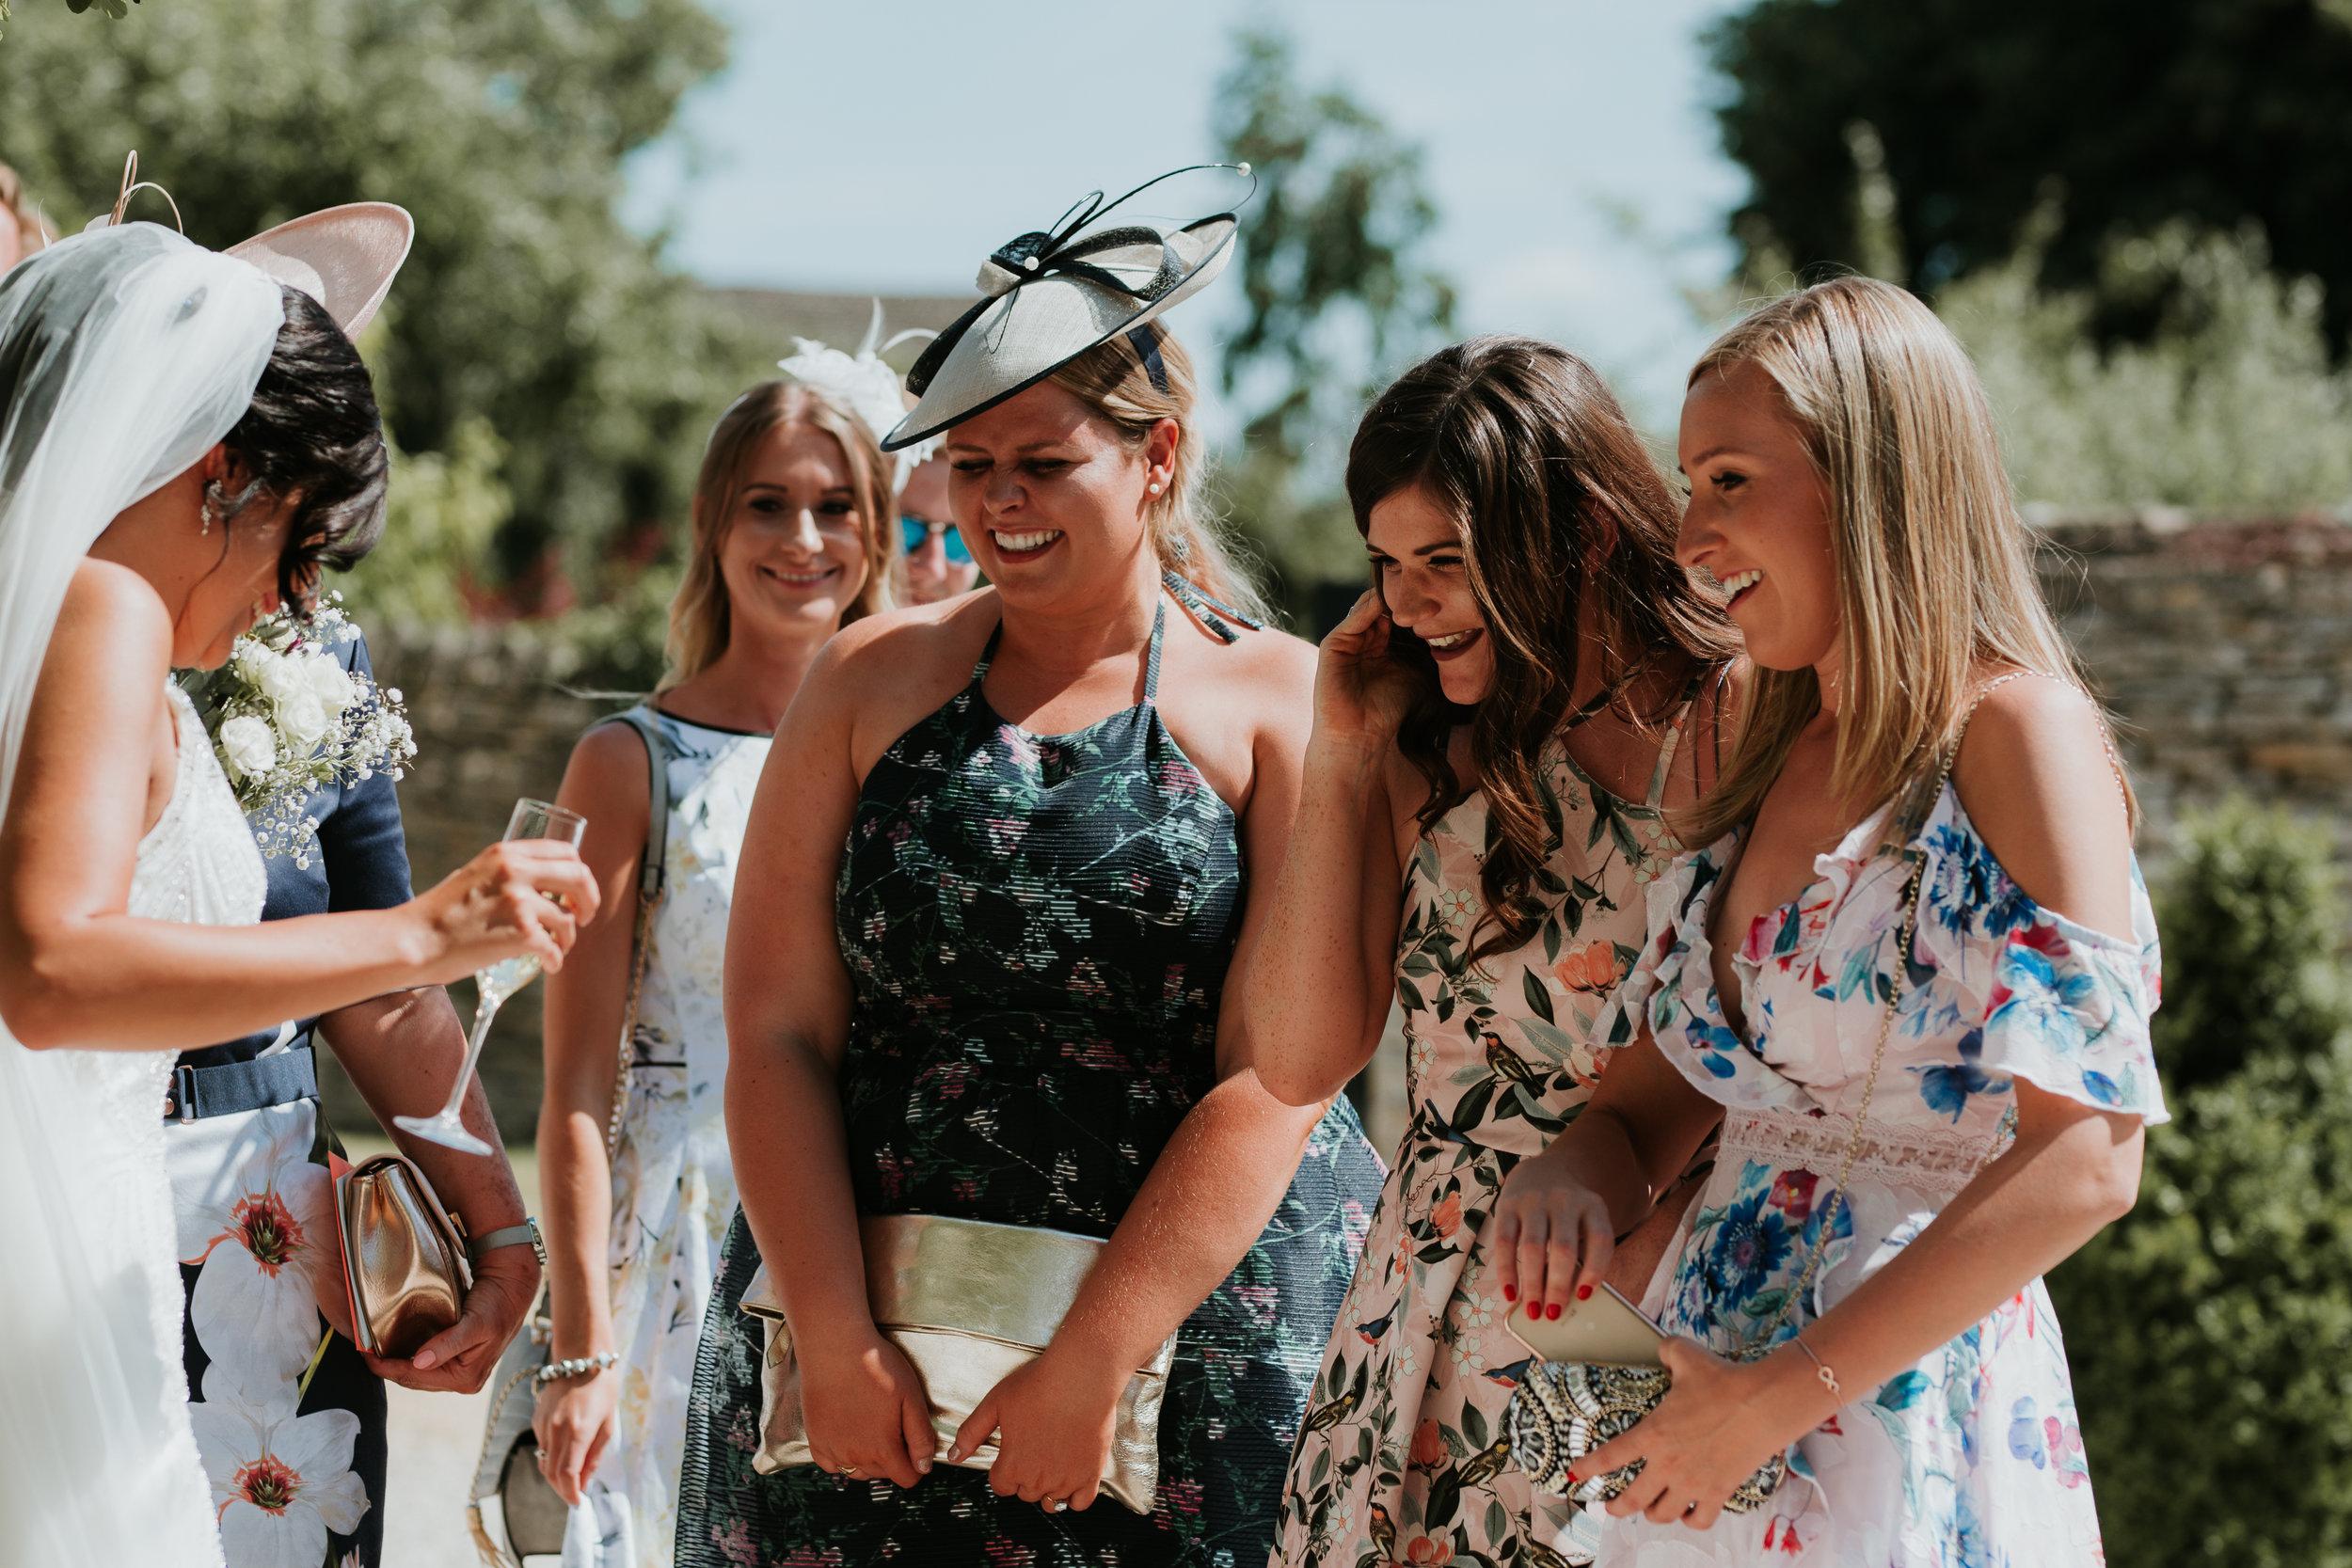 Oxfordshire-wedding-photographer-45.jpg